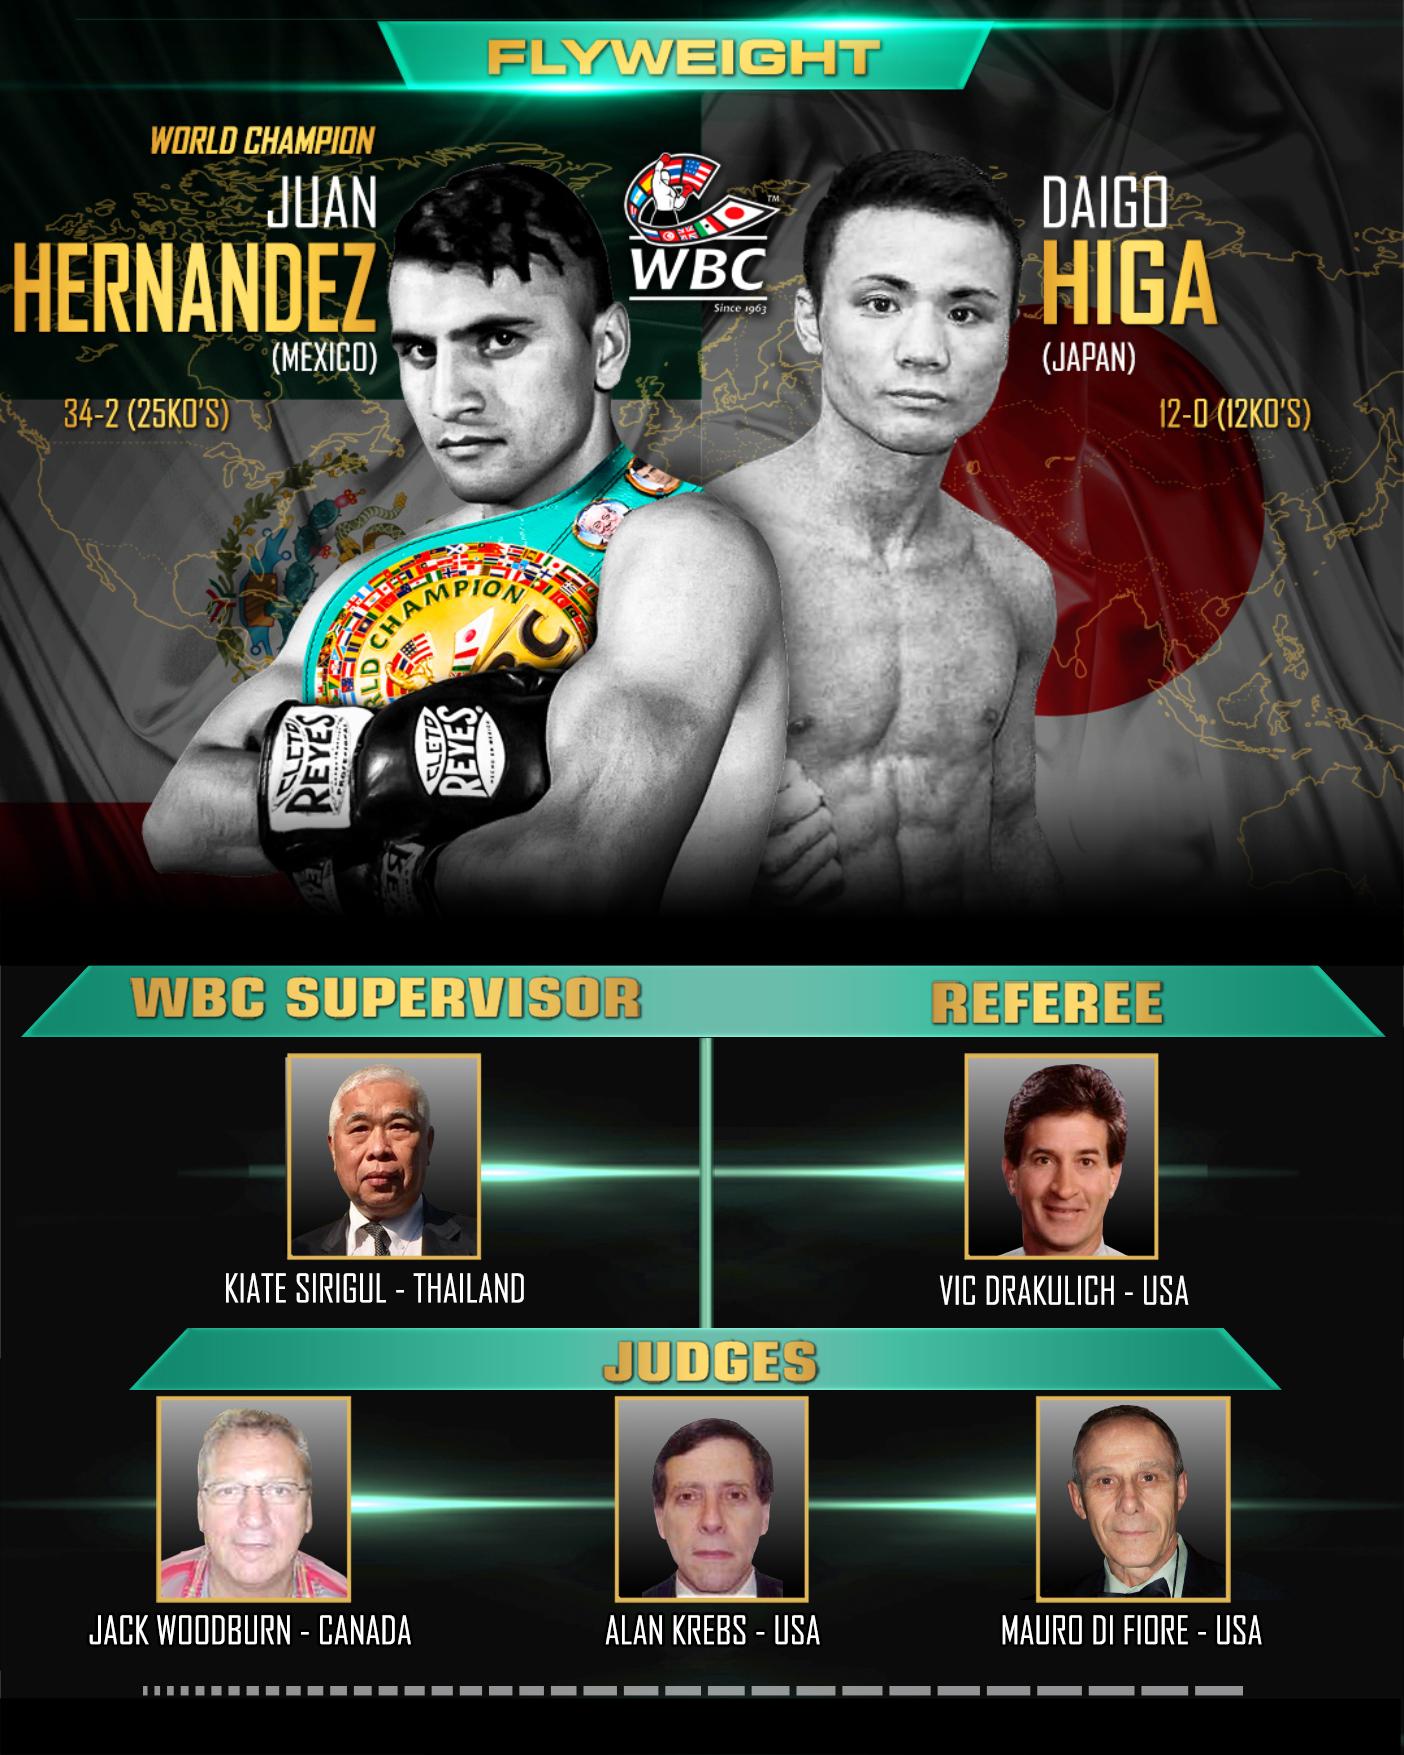 JUAN-CHURRITOS-HERNANDEZ-VS-DAIGO-HIGA-RO